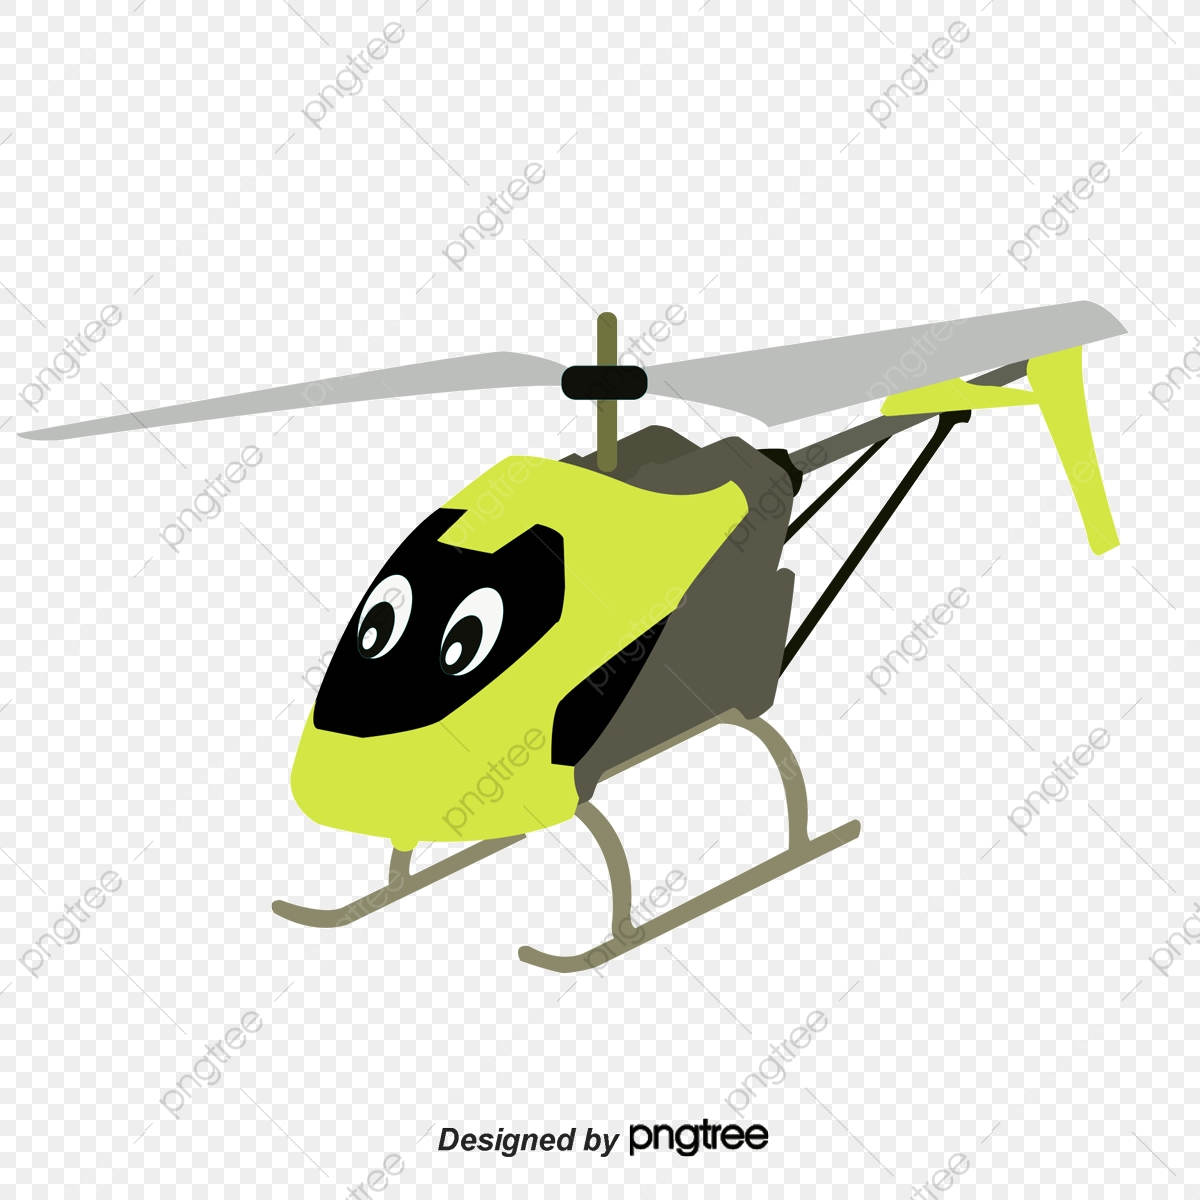 Kartun Helikopter Kartun Helikopter Realistik Fail PNG